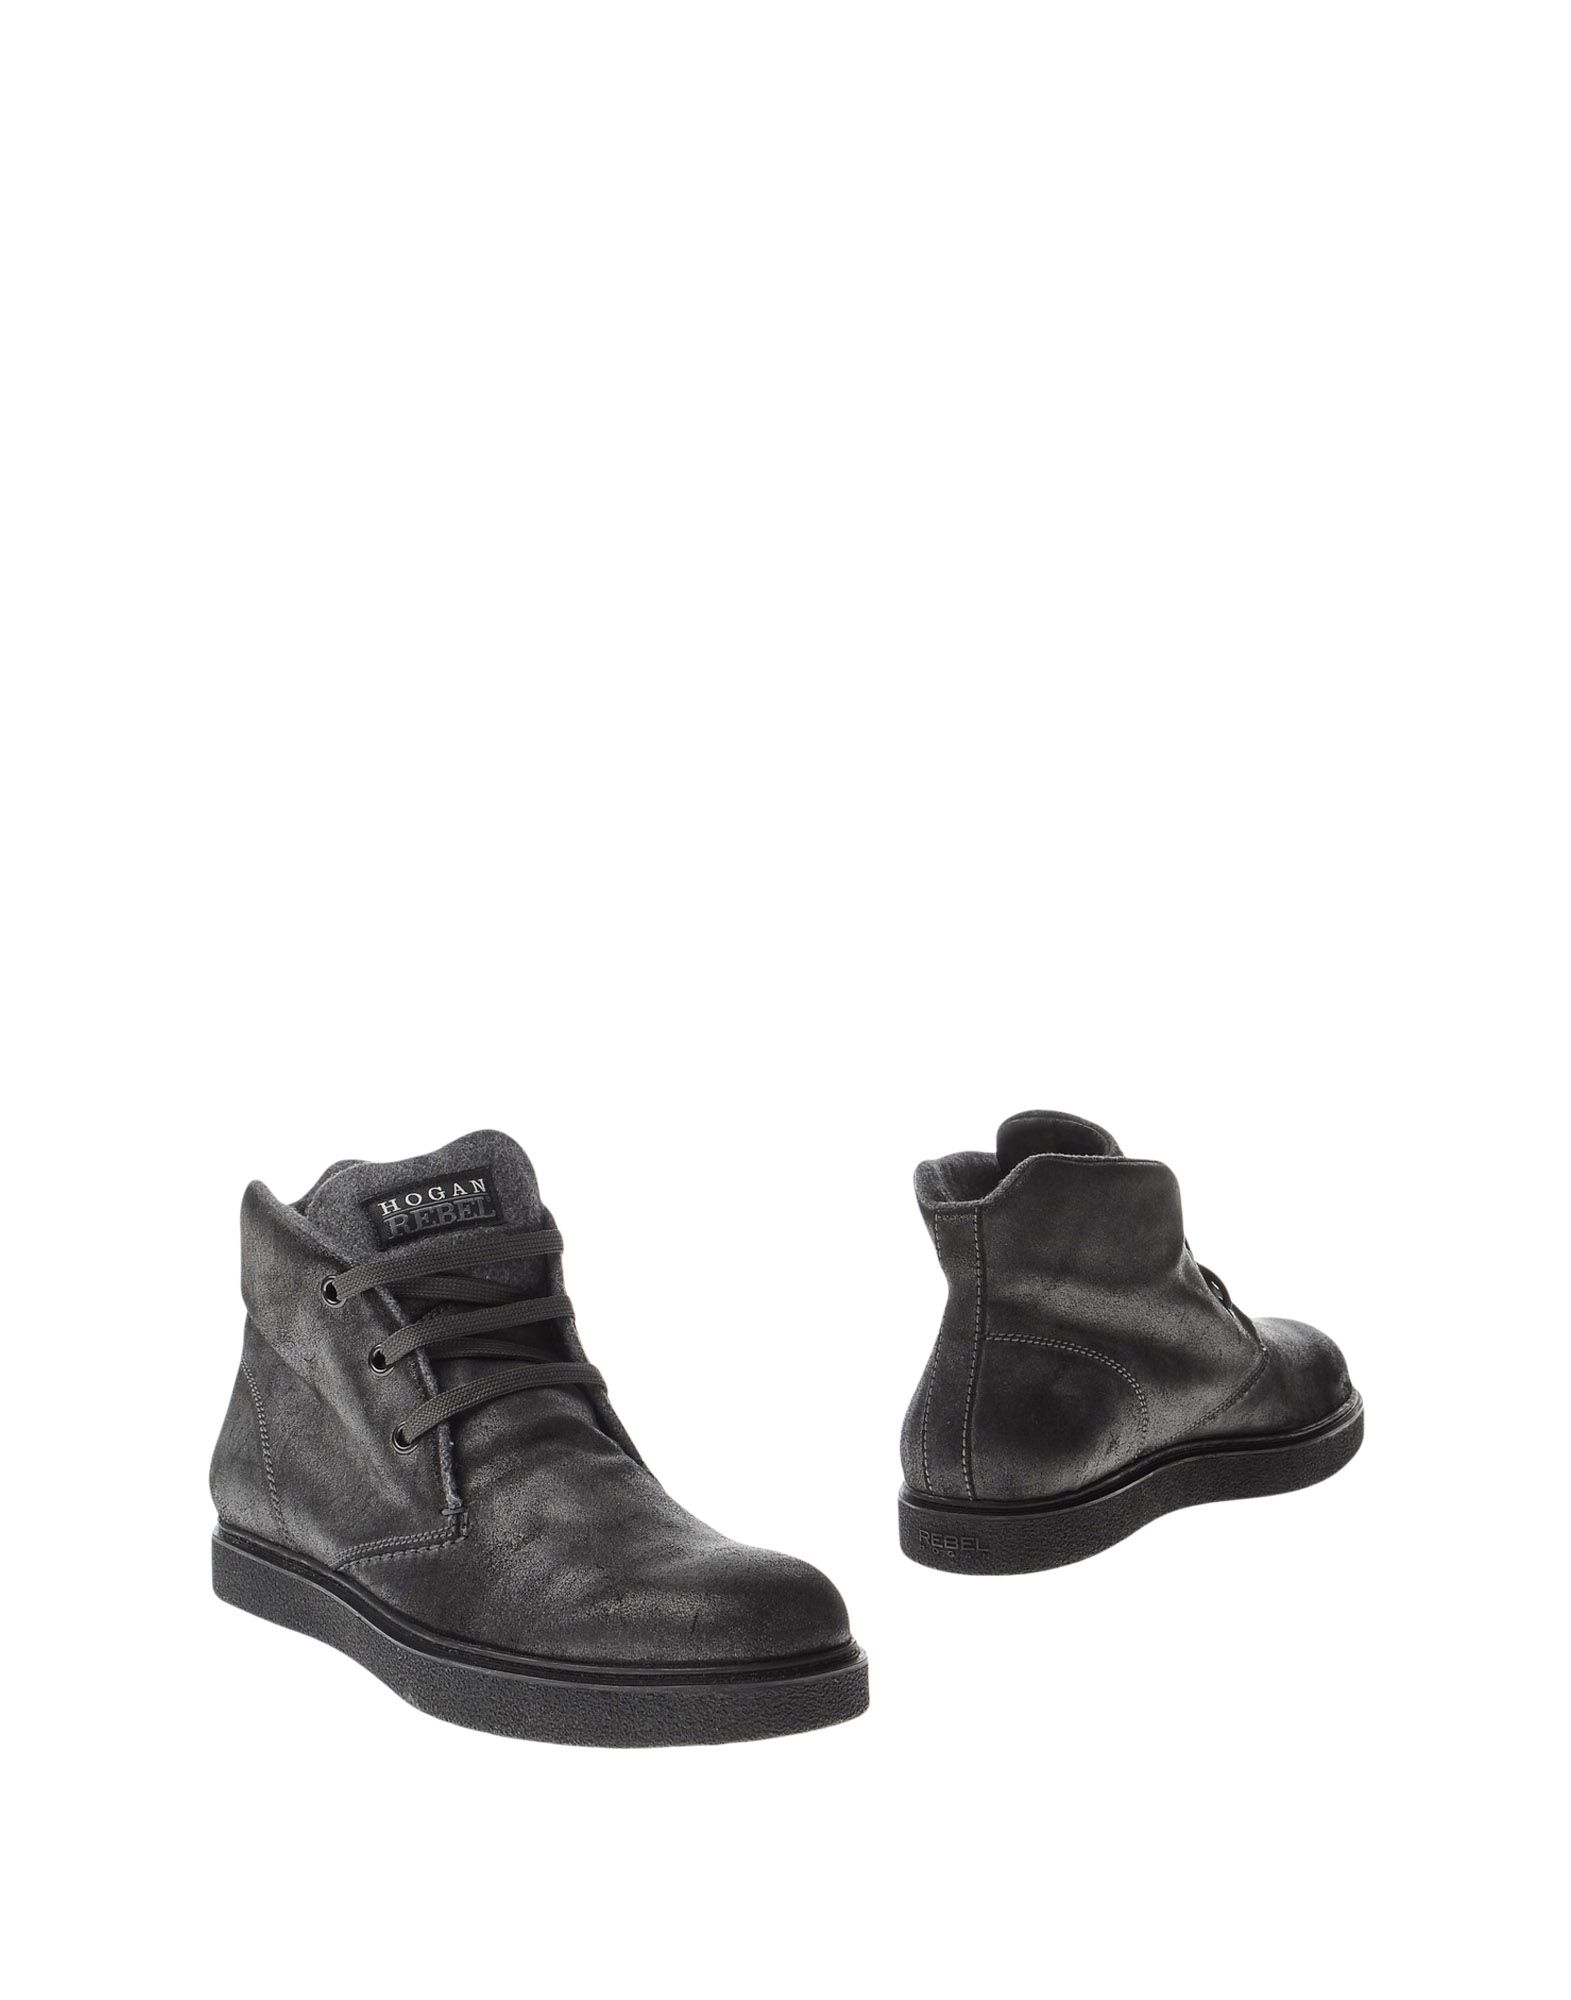 HOGAN REBEL Boots in Lead